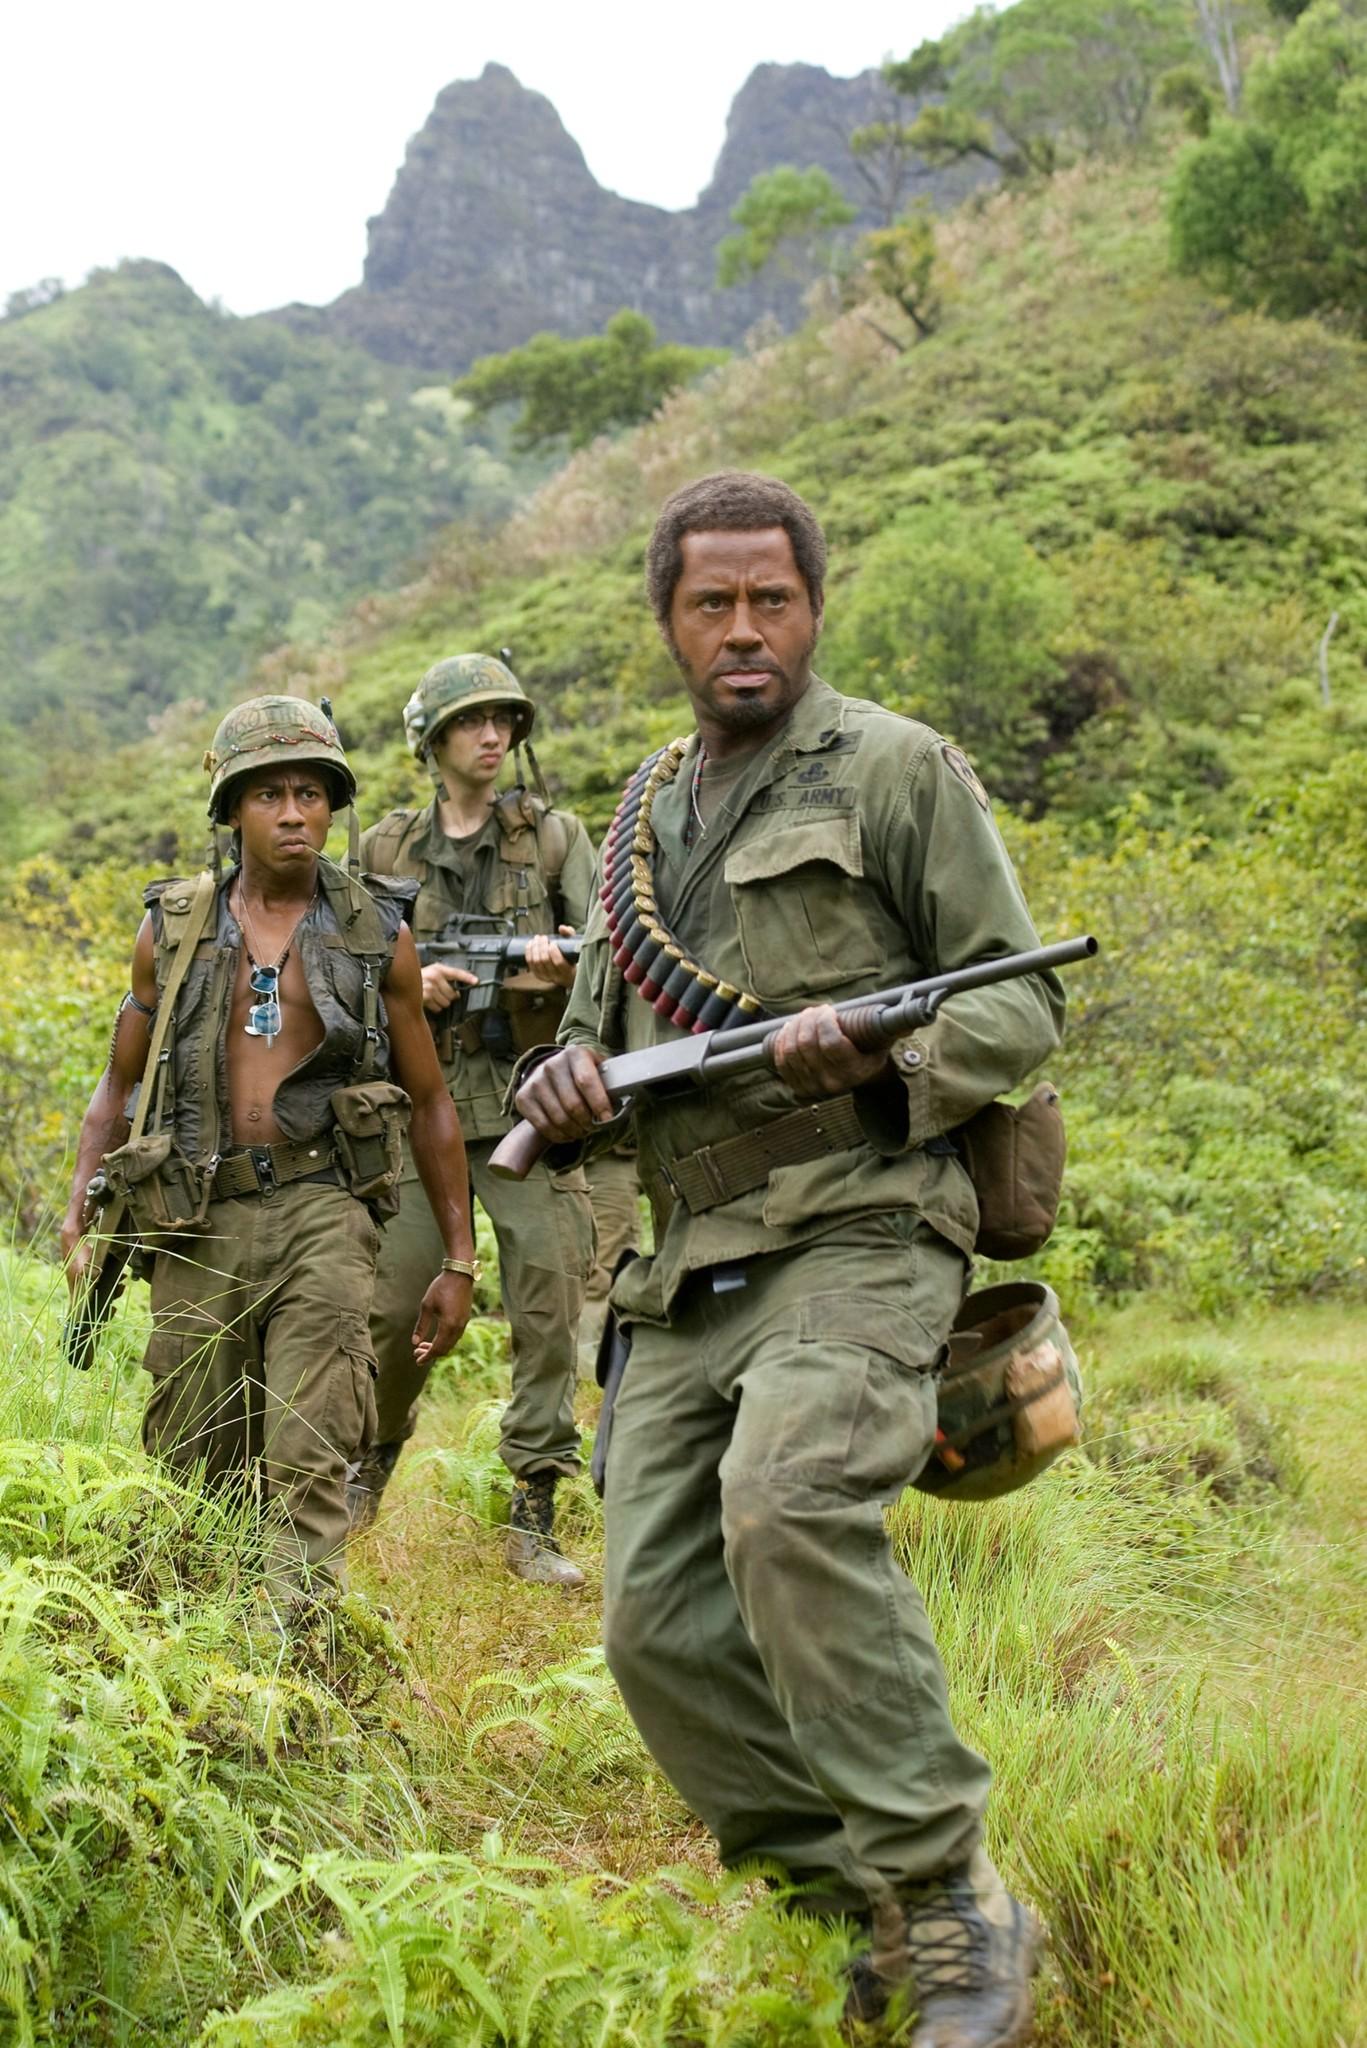 Robert Downey Jr., Jay Baruchel, and Brandon T. Jackson in Tropic Thunder (2008)